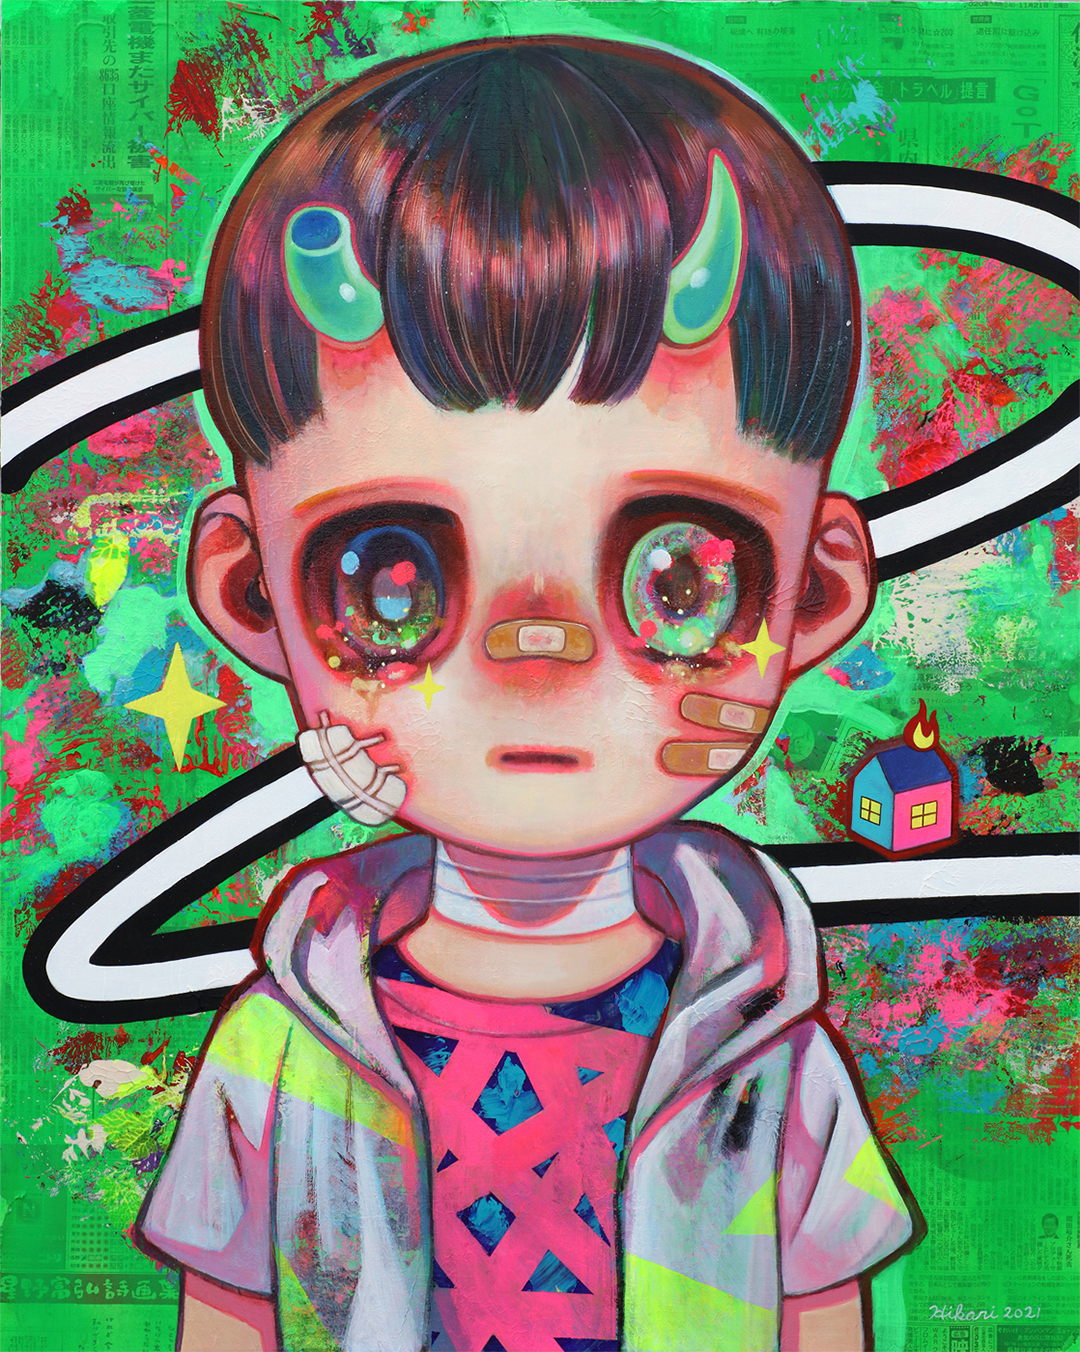 GirlsclubAsia-Artist-Hikari Shimoda_Living Now #3_Acrylic, oil and newspaper on canvas_35.8 x 28.6